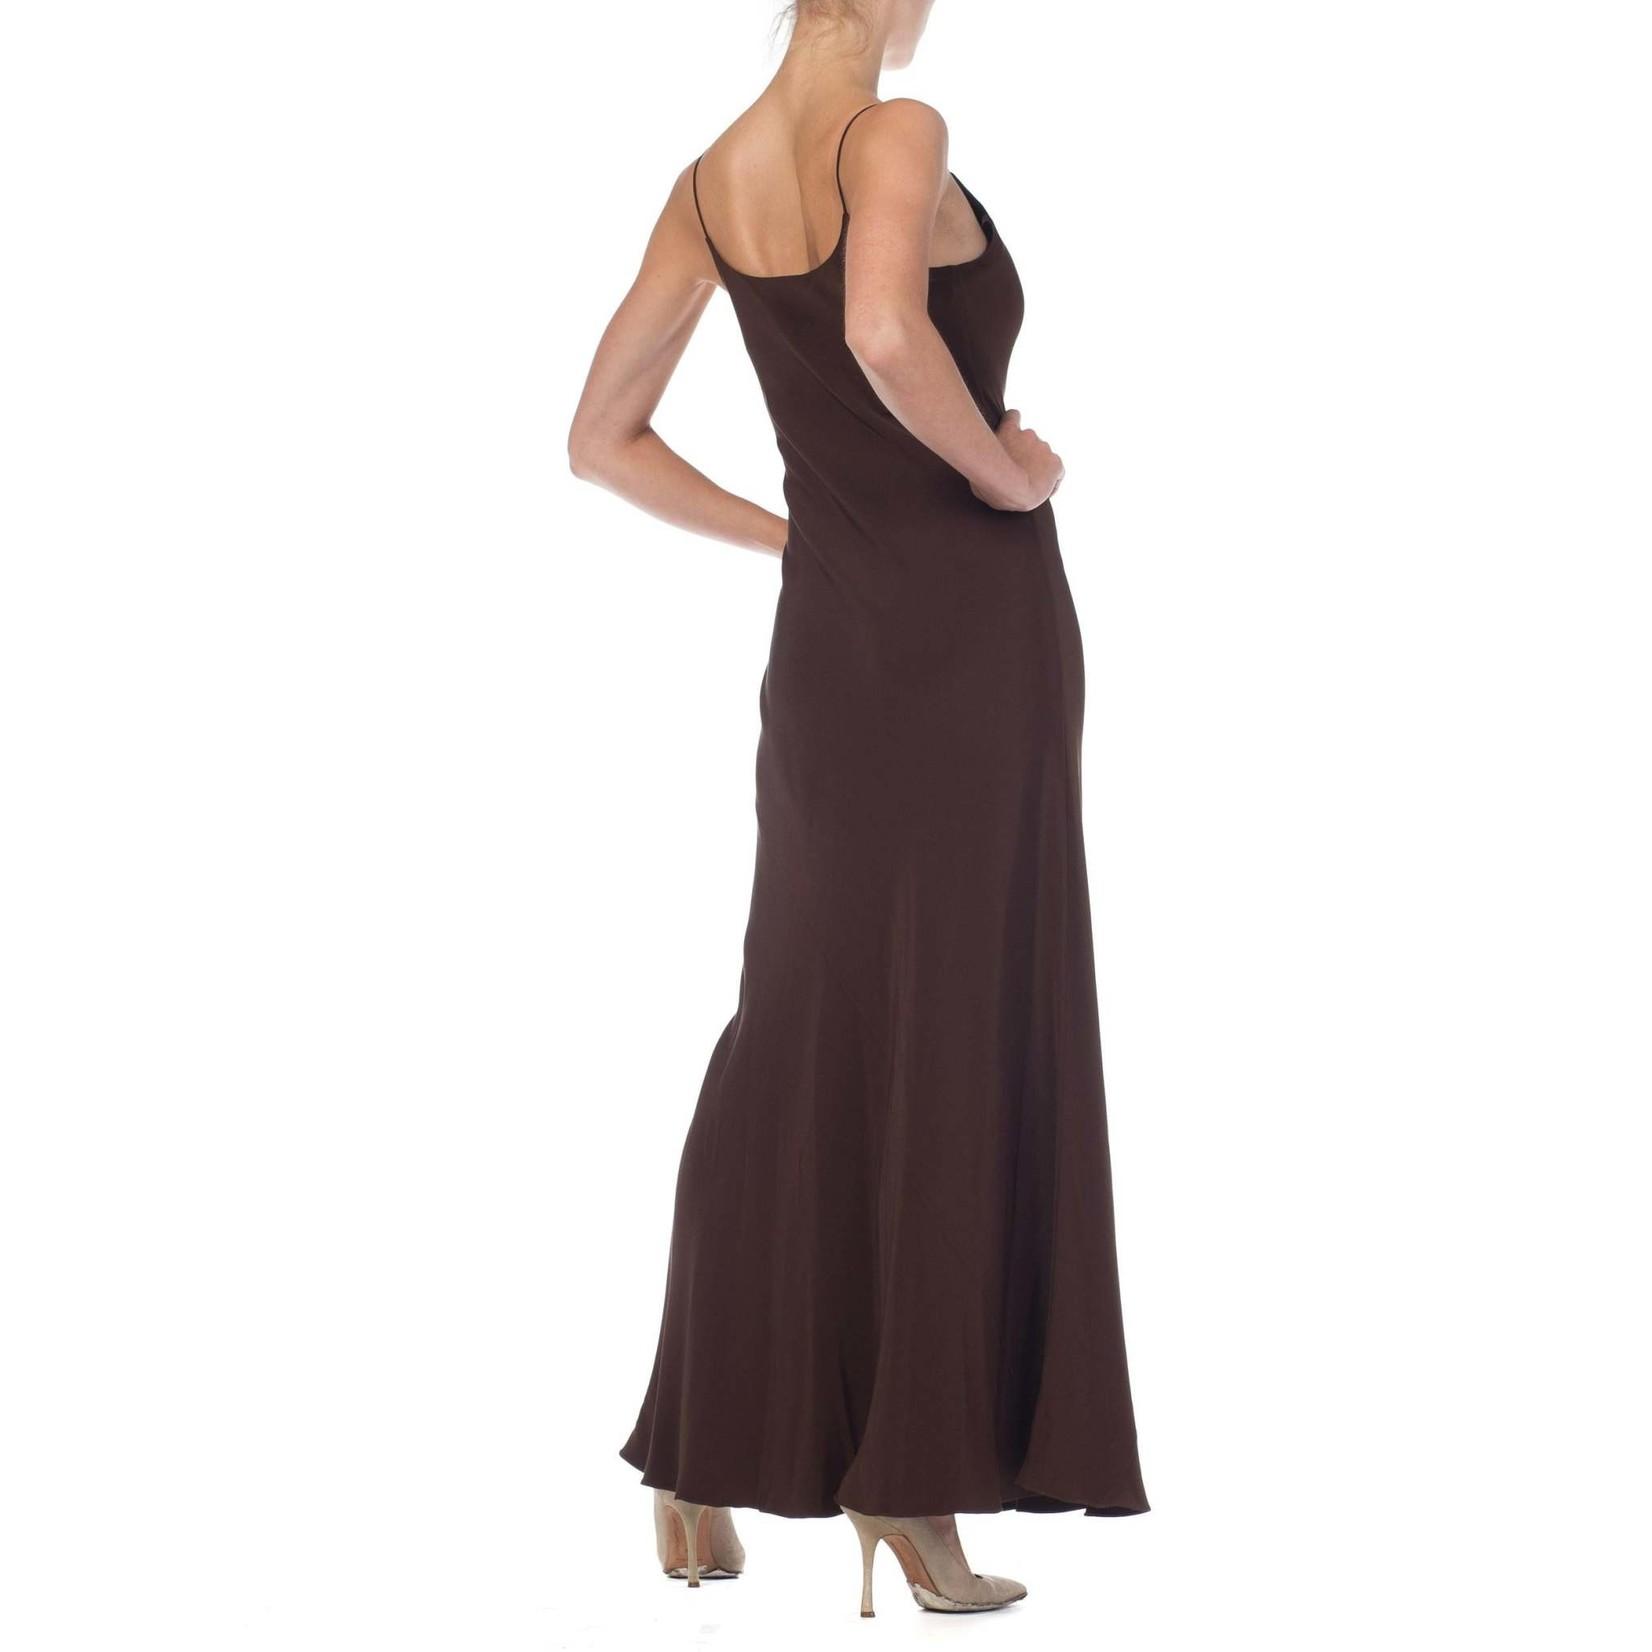 Morphew 1990s Melinda Eng Bergdorf Goodman Chocolate Brown Bias Cut Silk Crepe Minimalist Slip Dress Gown